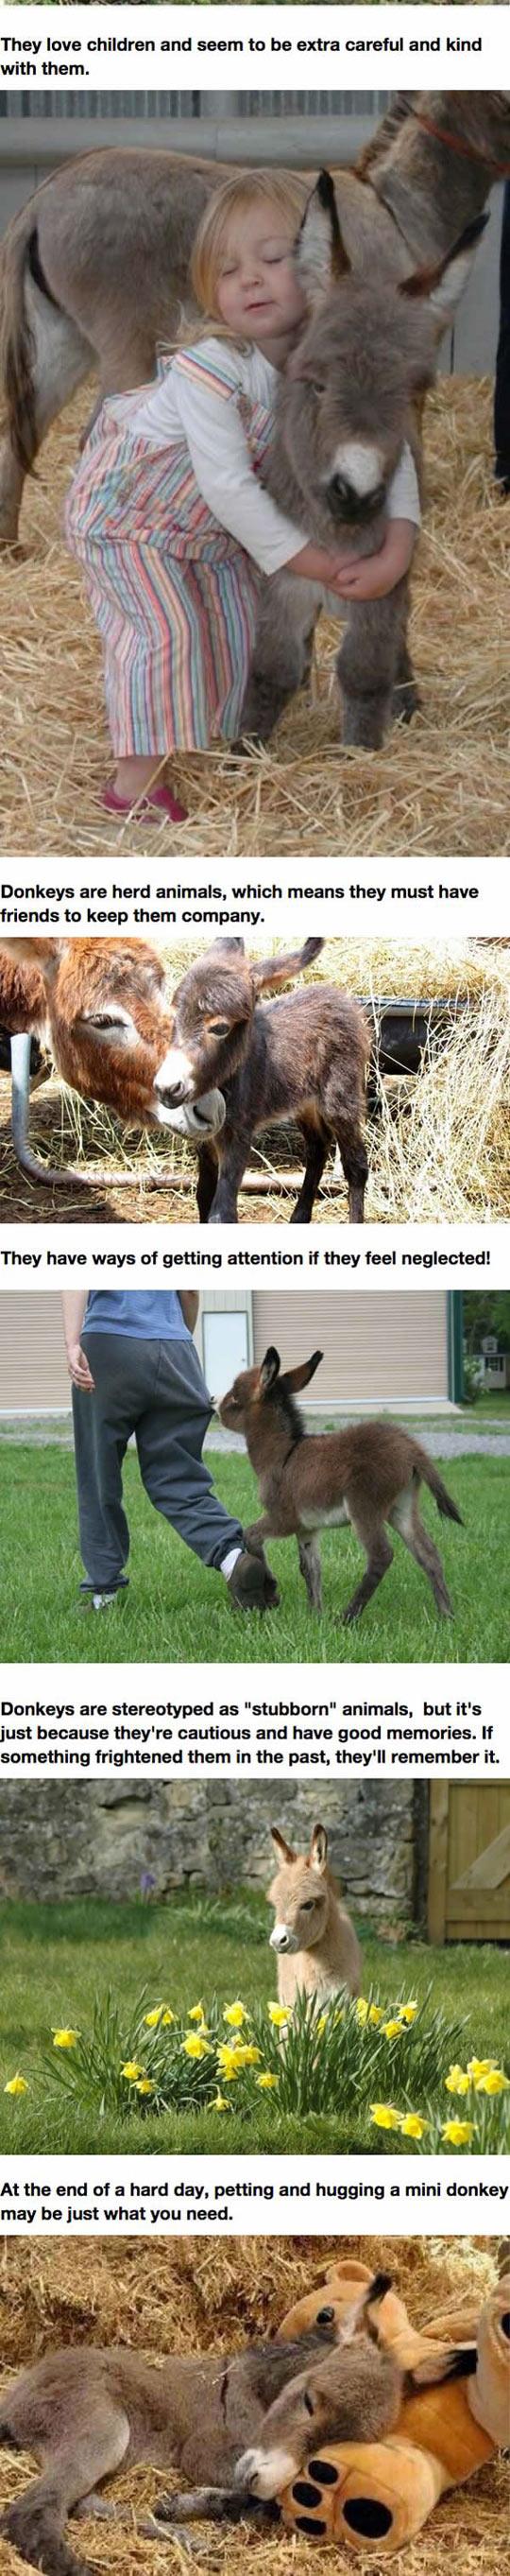 funny-mini-donkeys-dream-pet-kids-farm